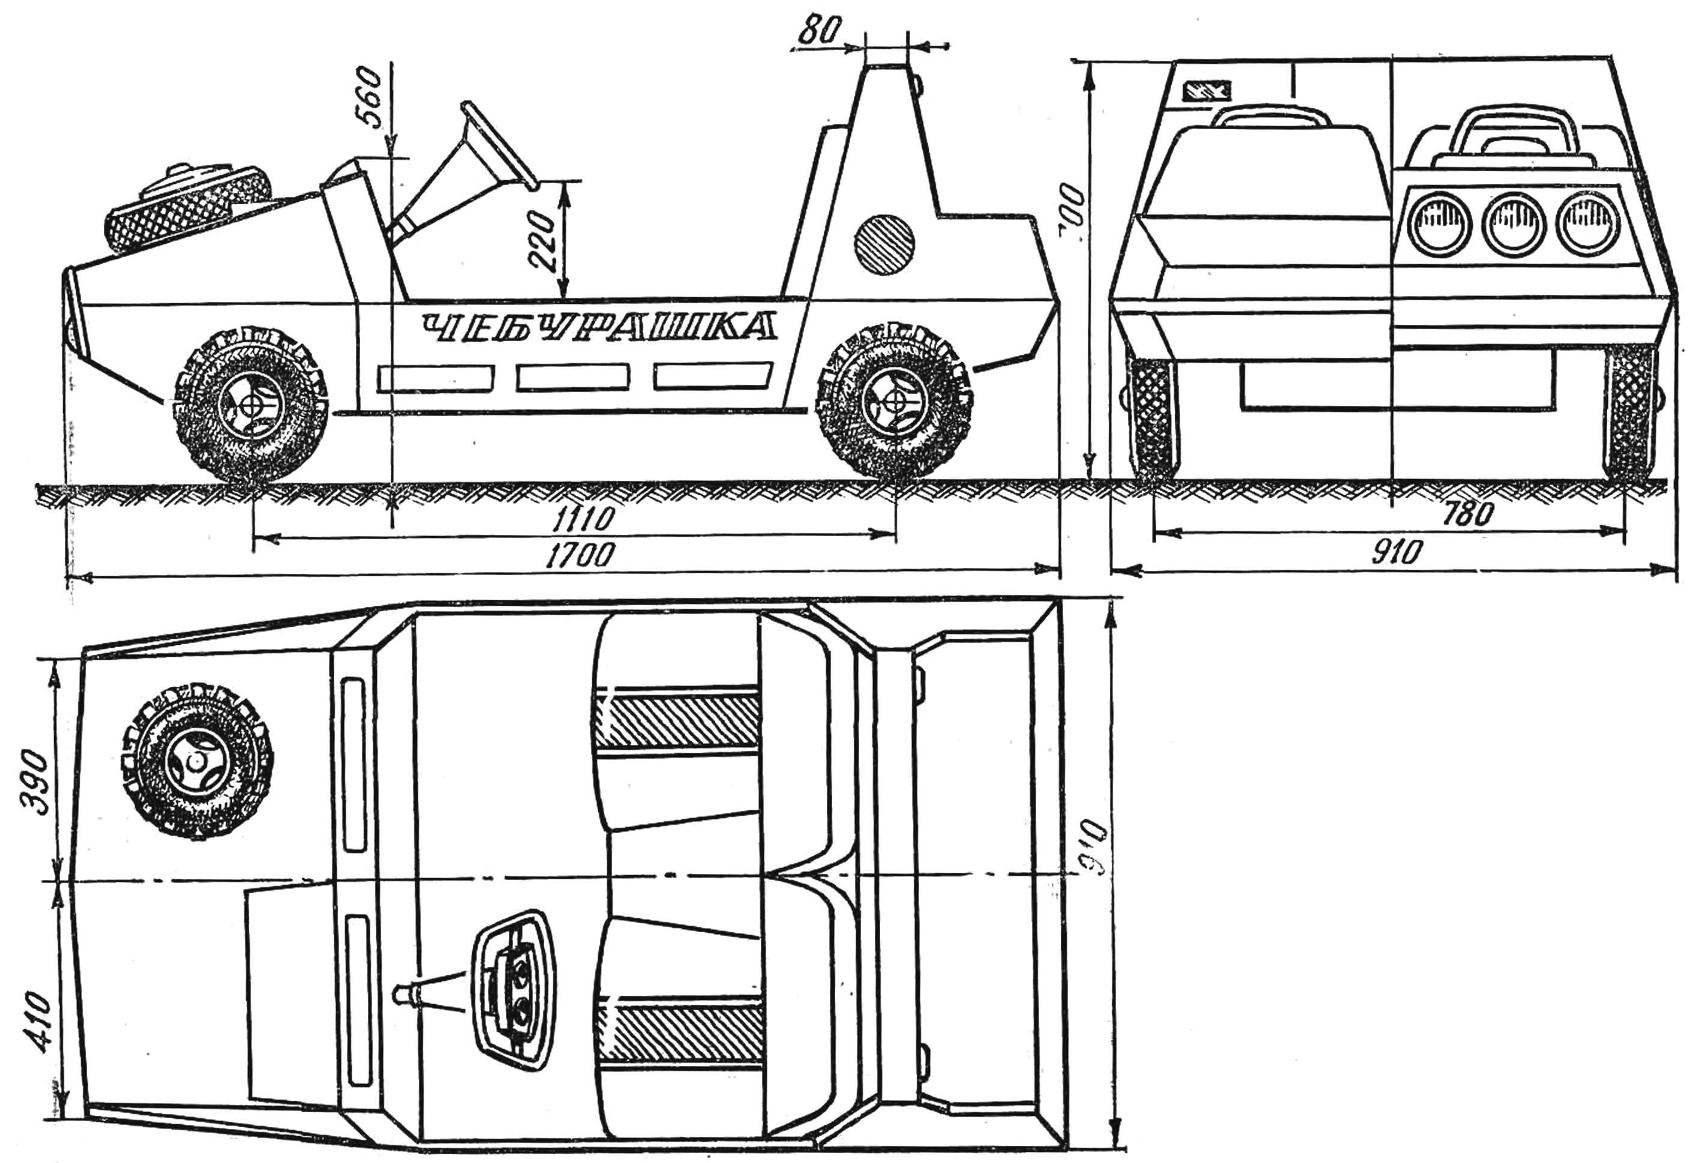 Микроавтомобиль «Чебурашка»